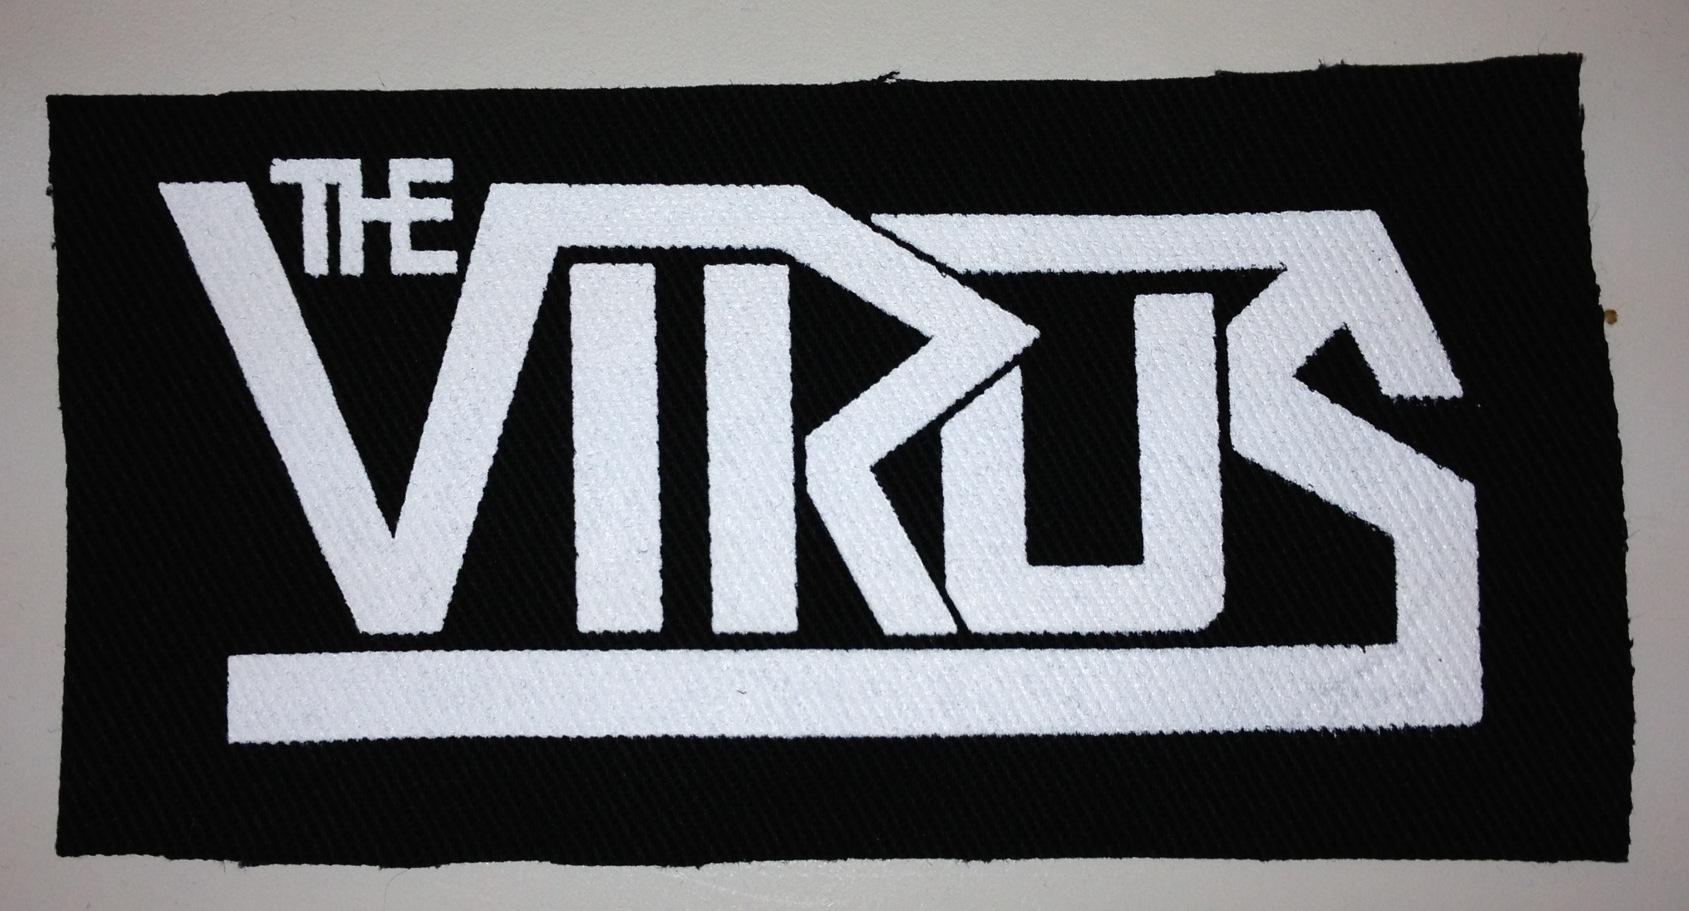 The Virus - White Logo on Black Patch · Viruspunks